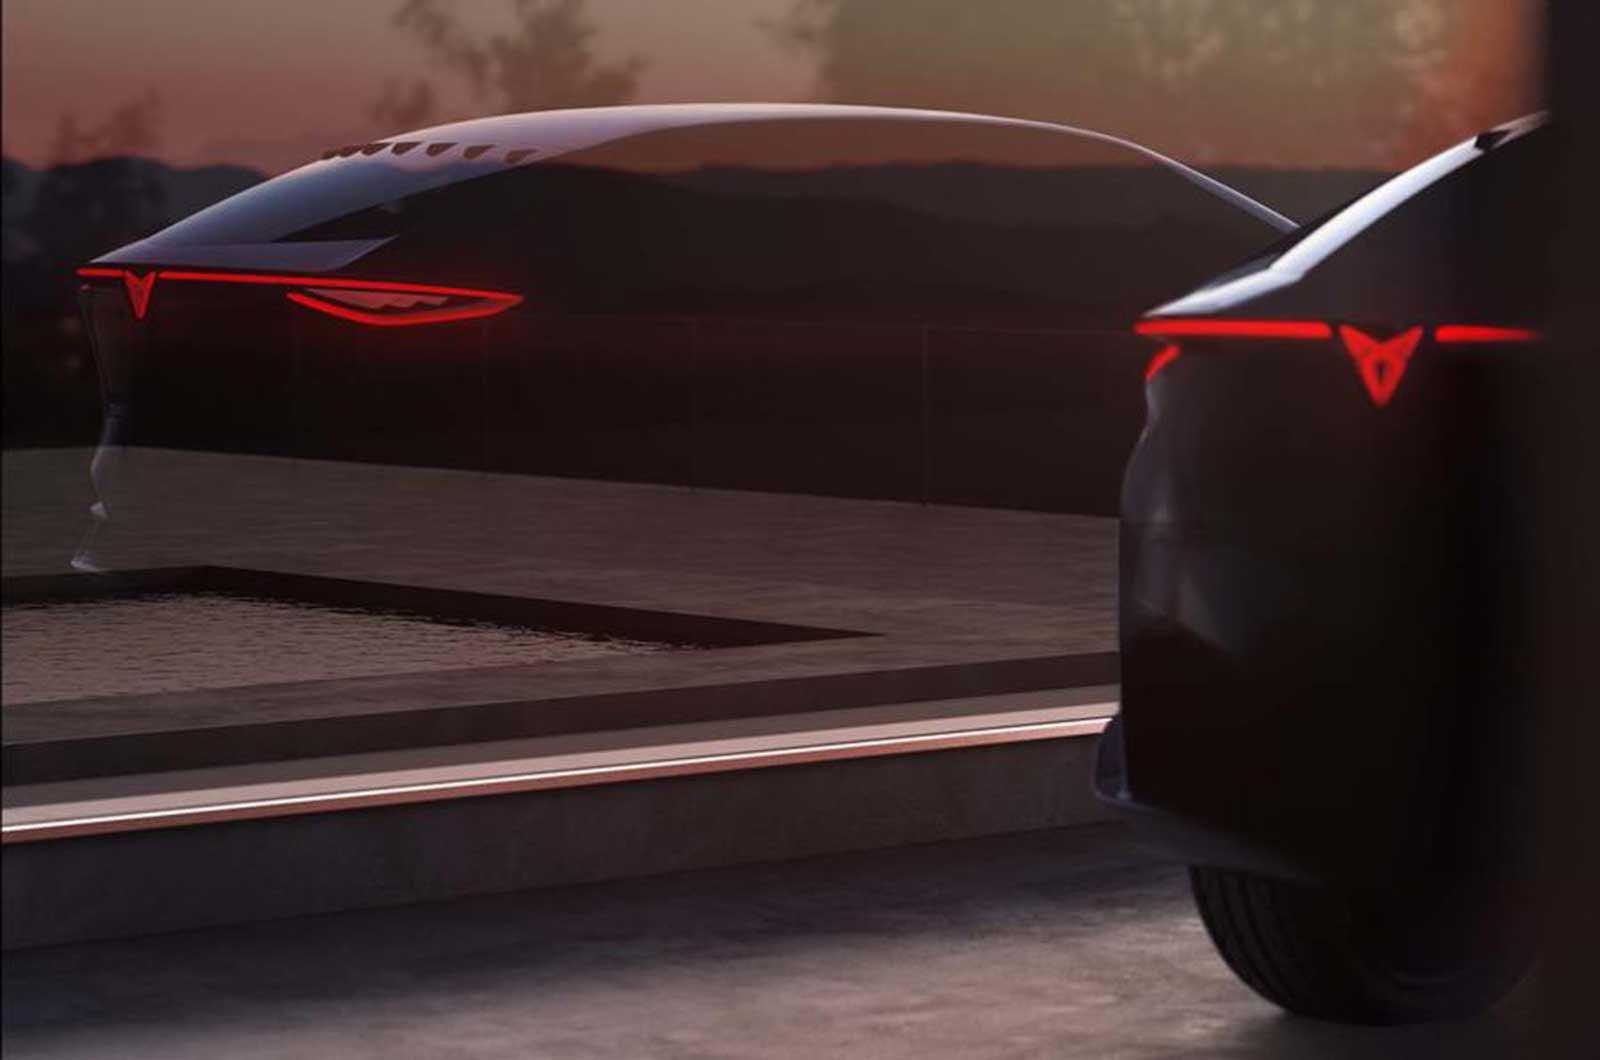 Cupra electric concept car